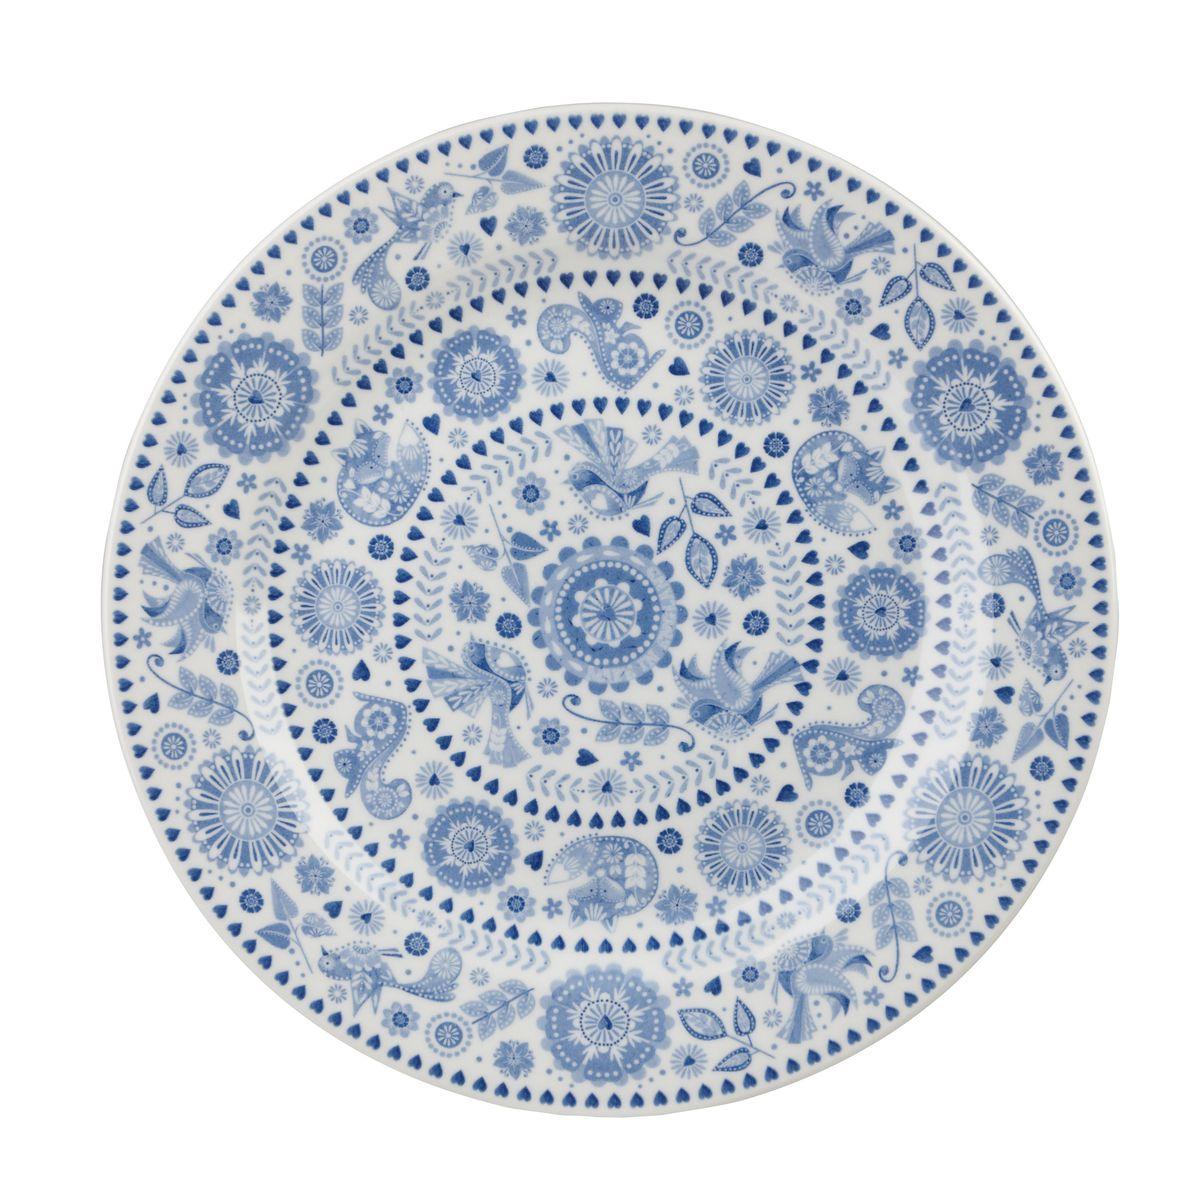 Тарелка обеденная Churchill, диаметр 26 см. PENZ00211 тарелка обеденная terracotta дерево жизни диаметр 26 см